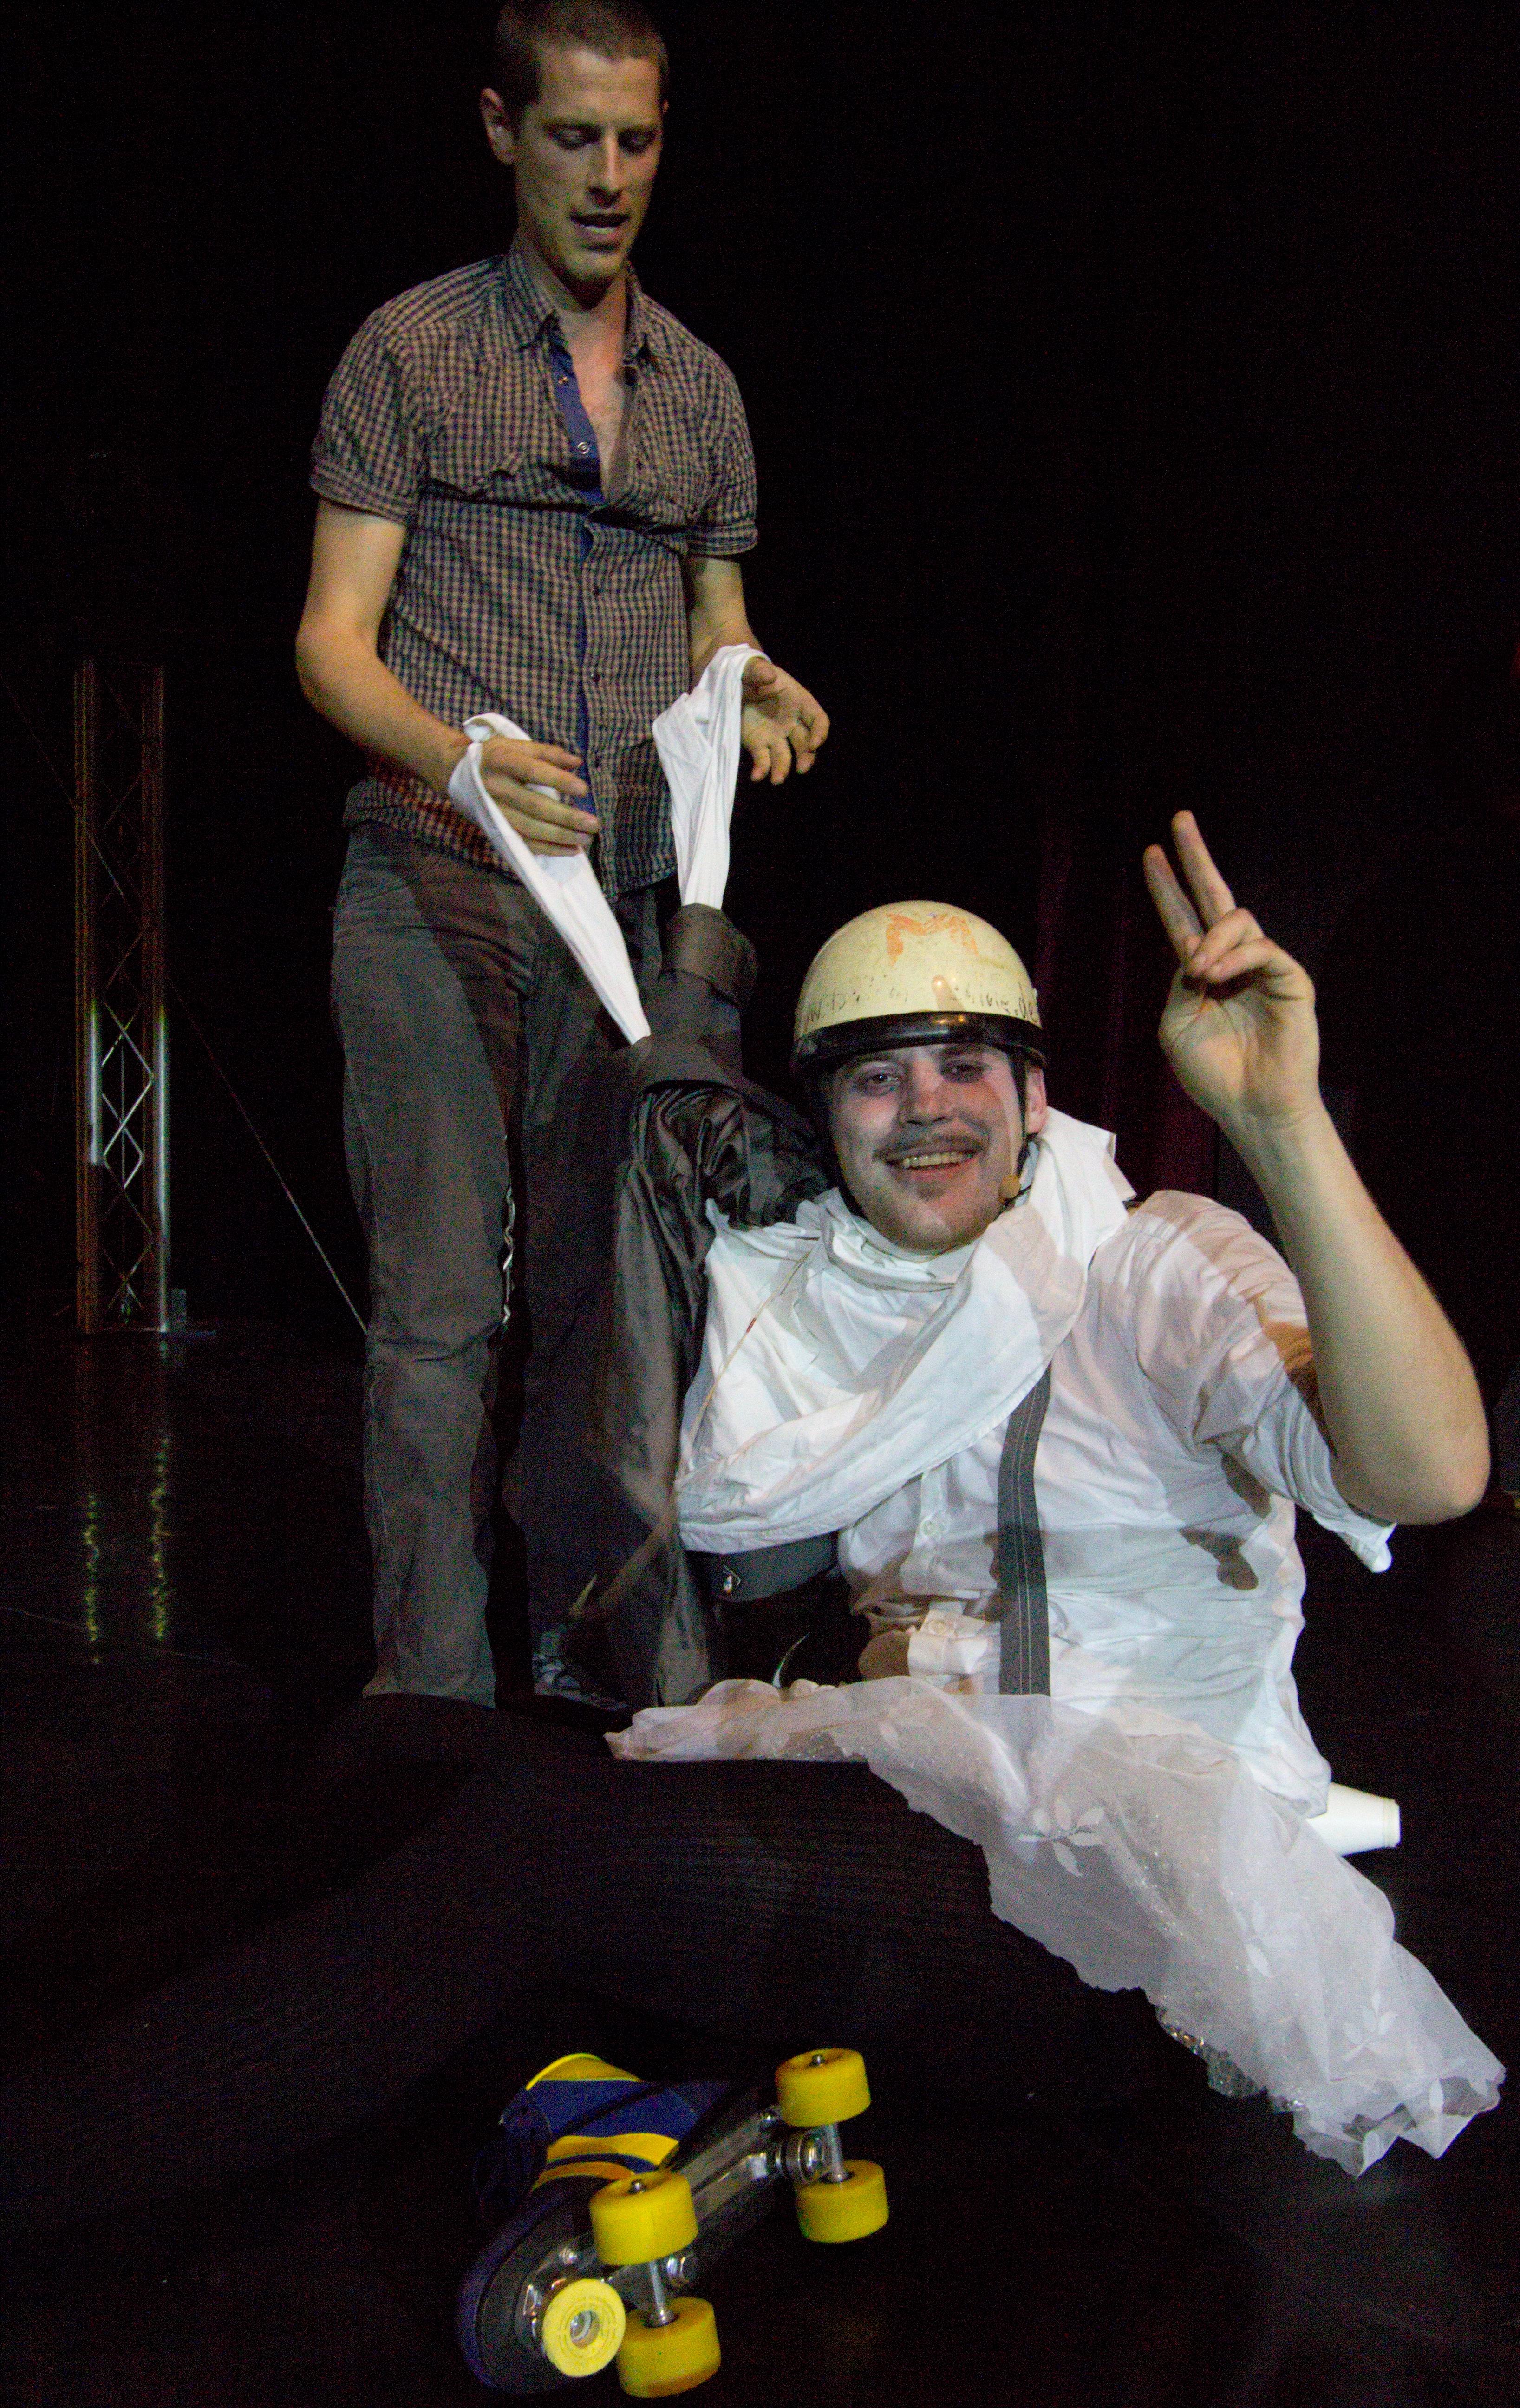 Berlin Juggling Convention 2013 Gala Show: Matthias Romir and Luke Burrage.